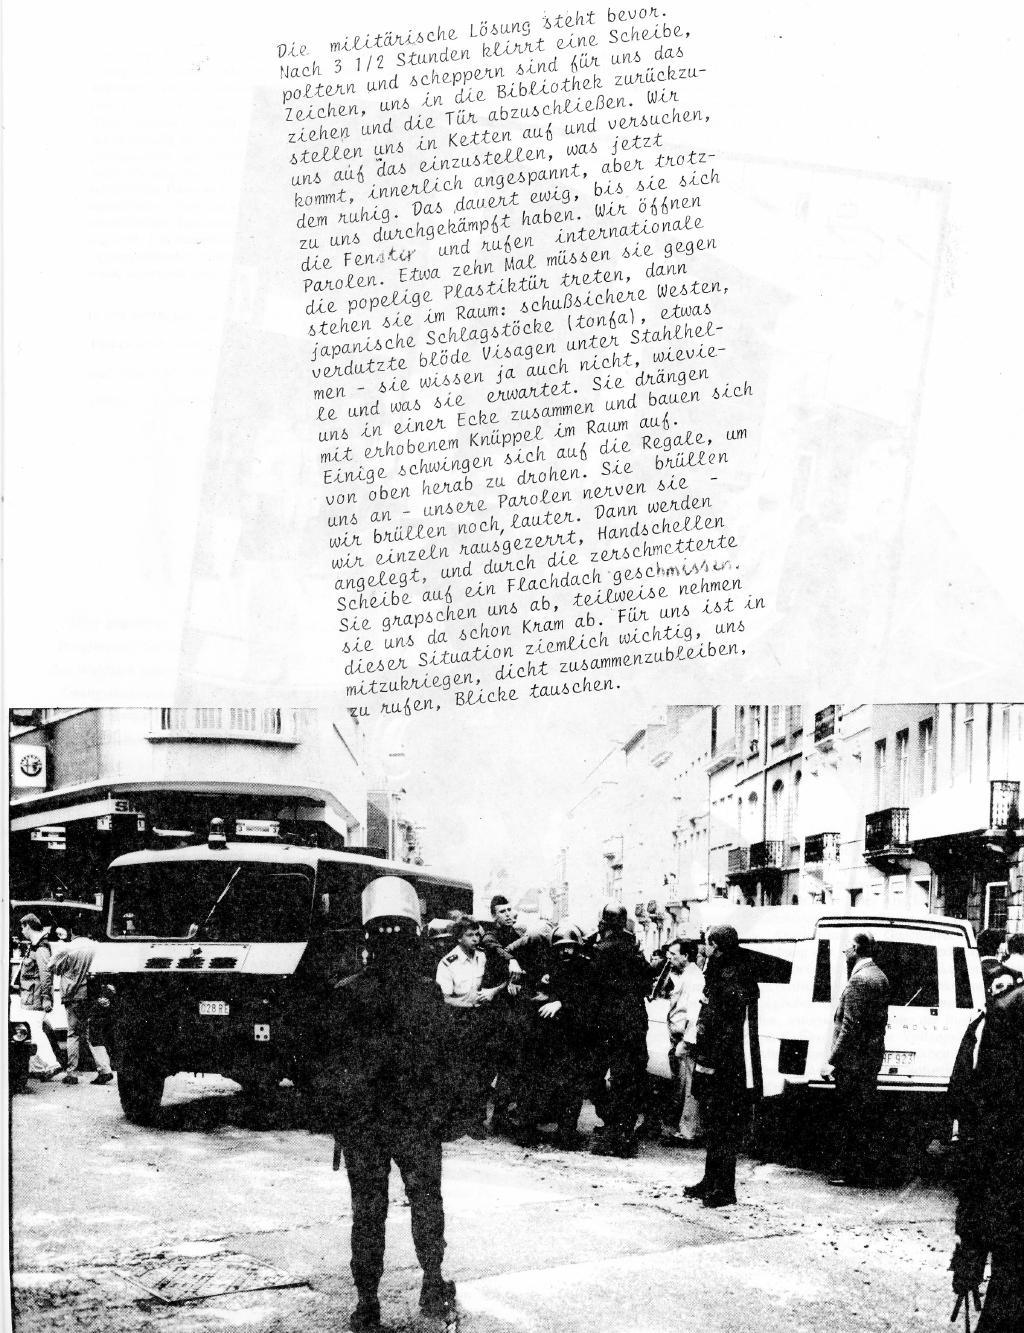 Belgien_Doku_Besetzung_EG_Kommission_1989_037